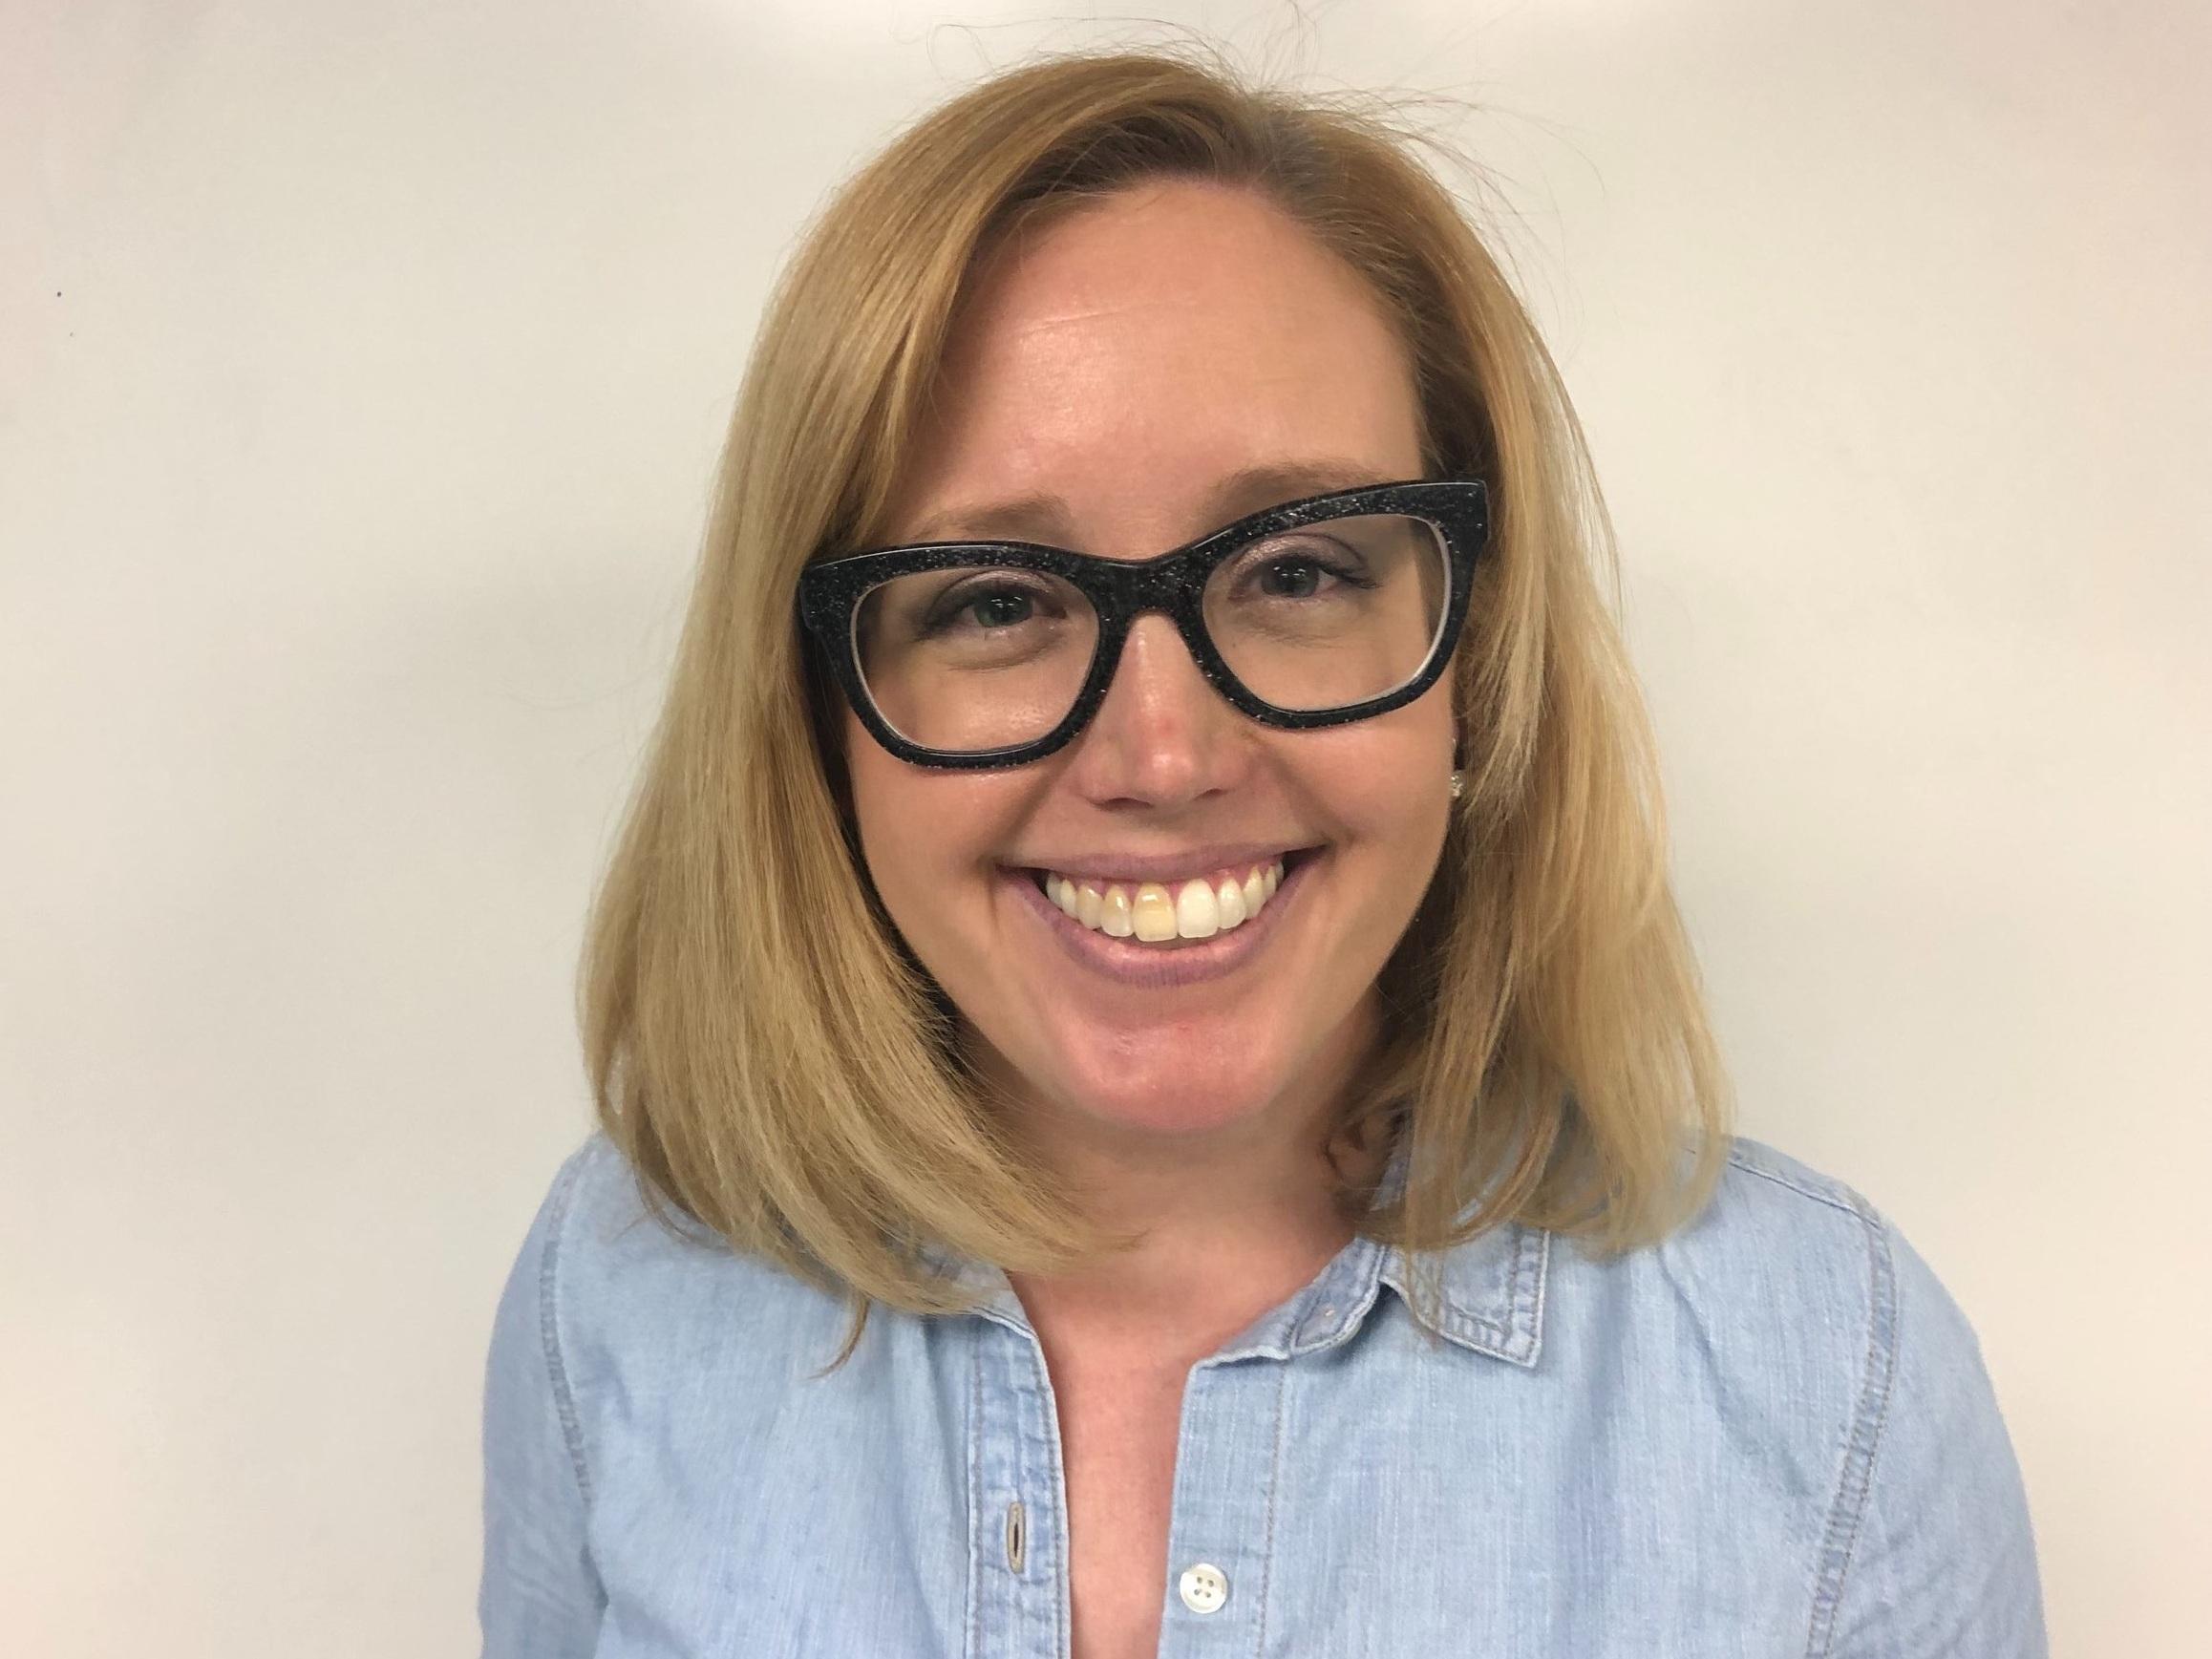 Erin Franey - District Directorefraney@accelerationacademy.org